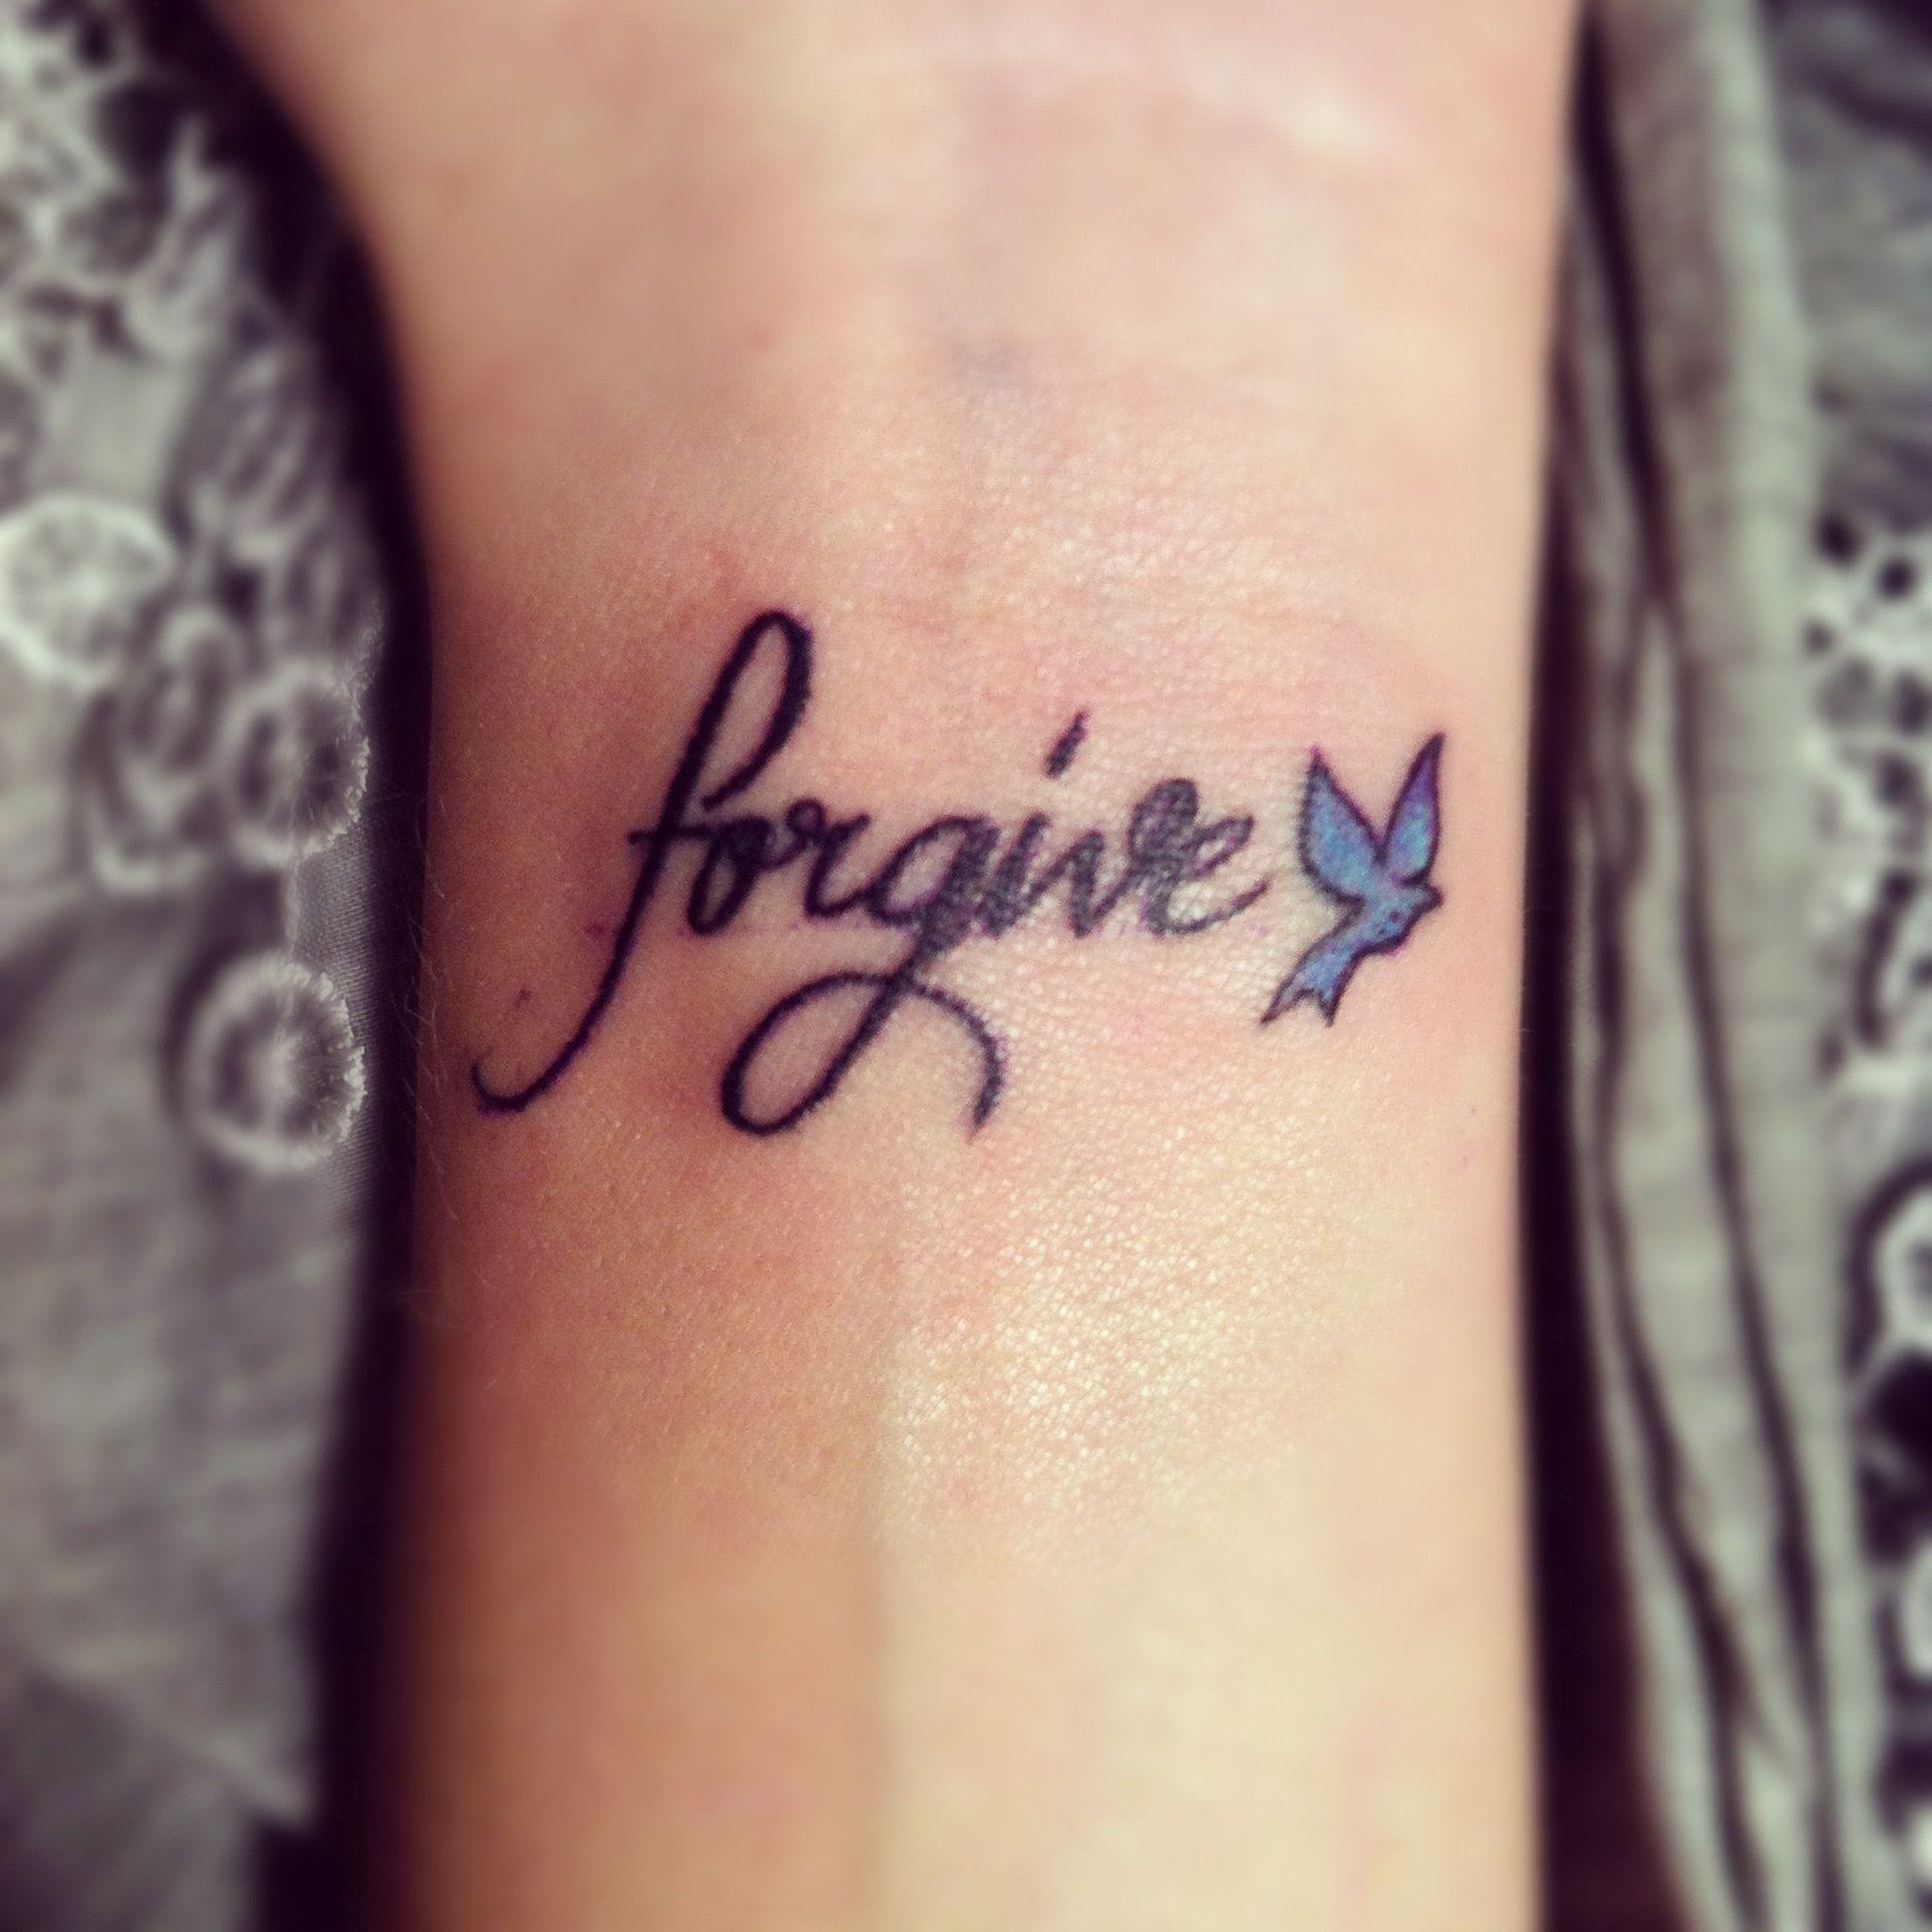 Freedom in forgiveness tattoo